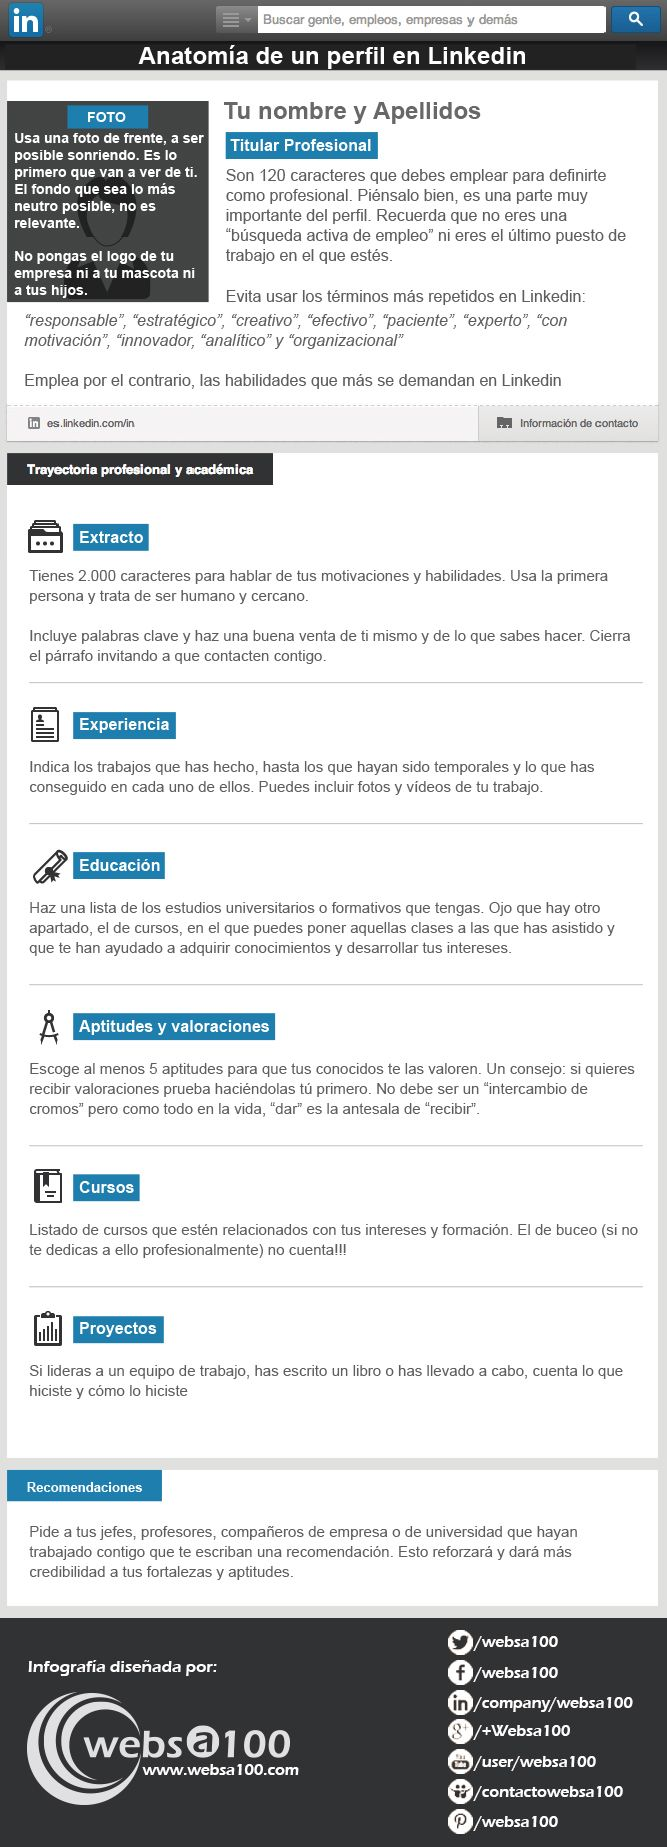 Anatomía de un perfil de Linkedin #infografia #infographic #socialmedia